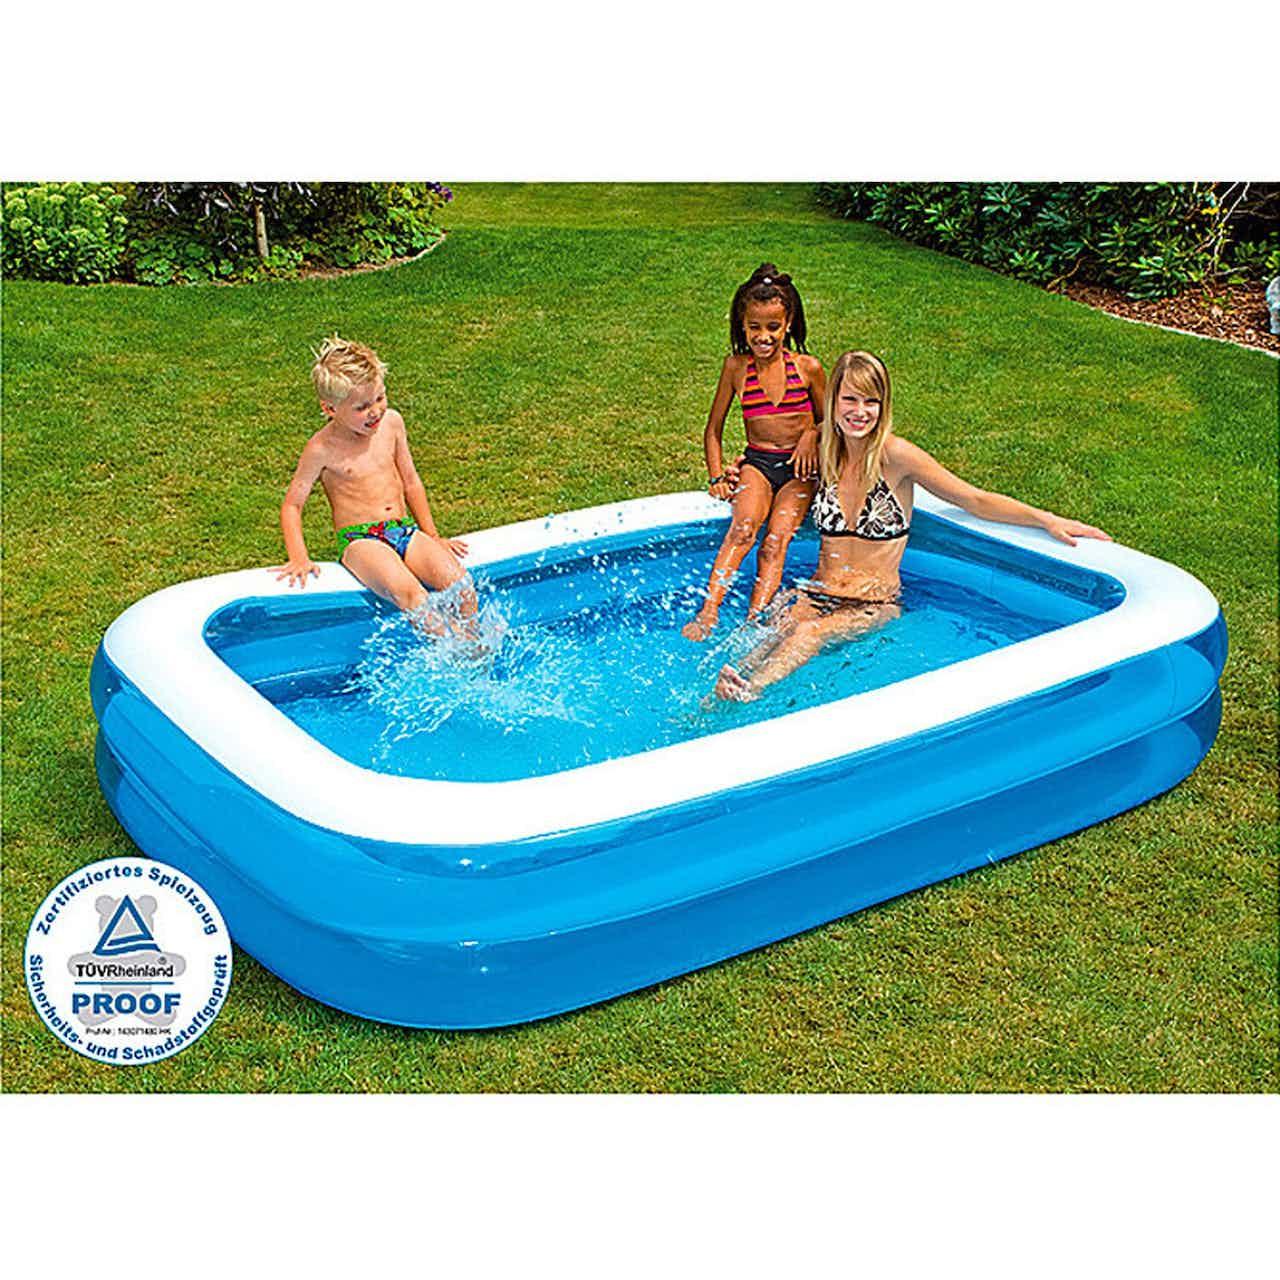 Swimming Pool Family 262 cm x 175 cm x 50 cm